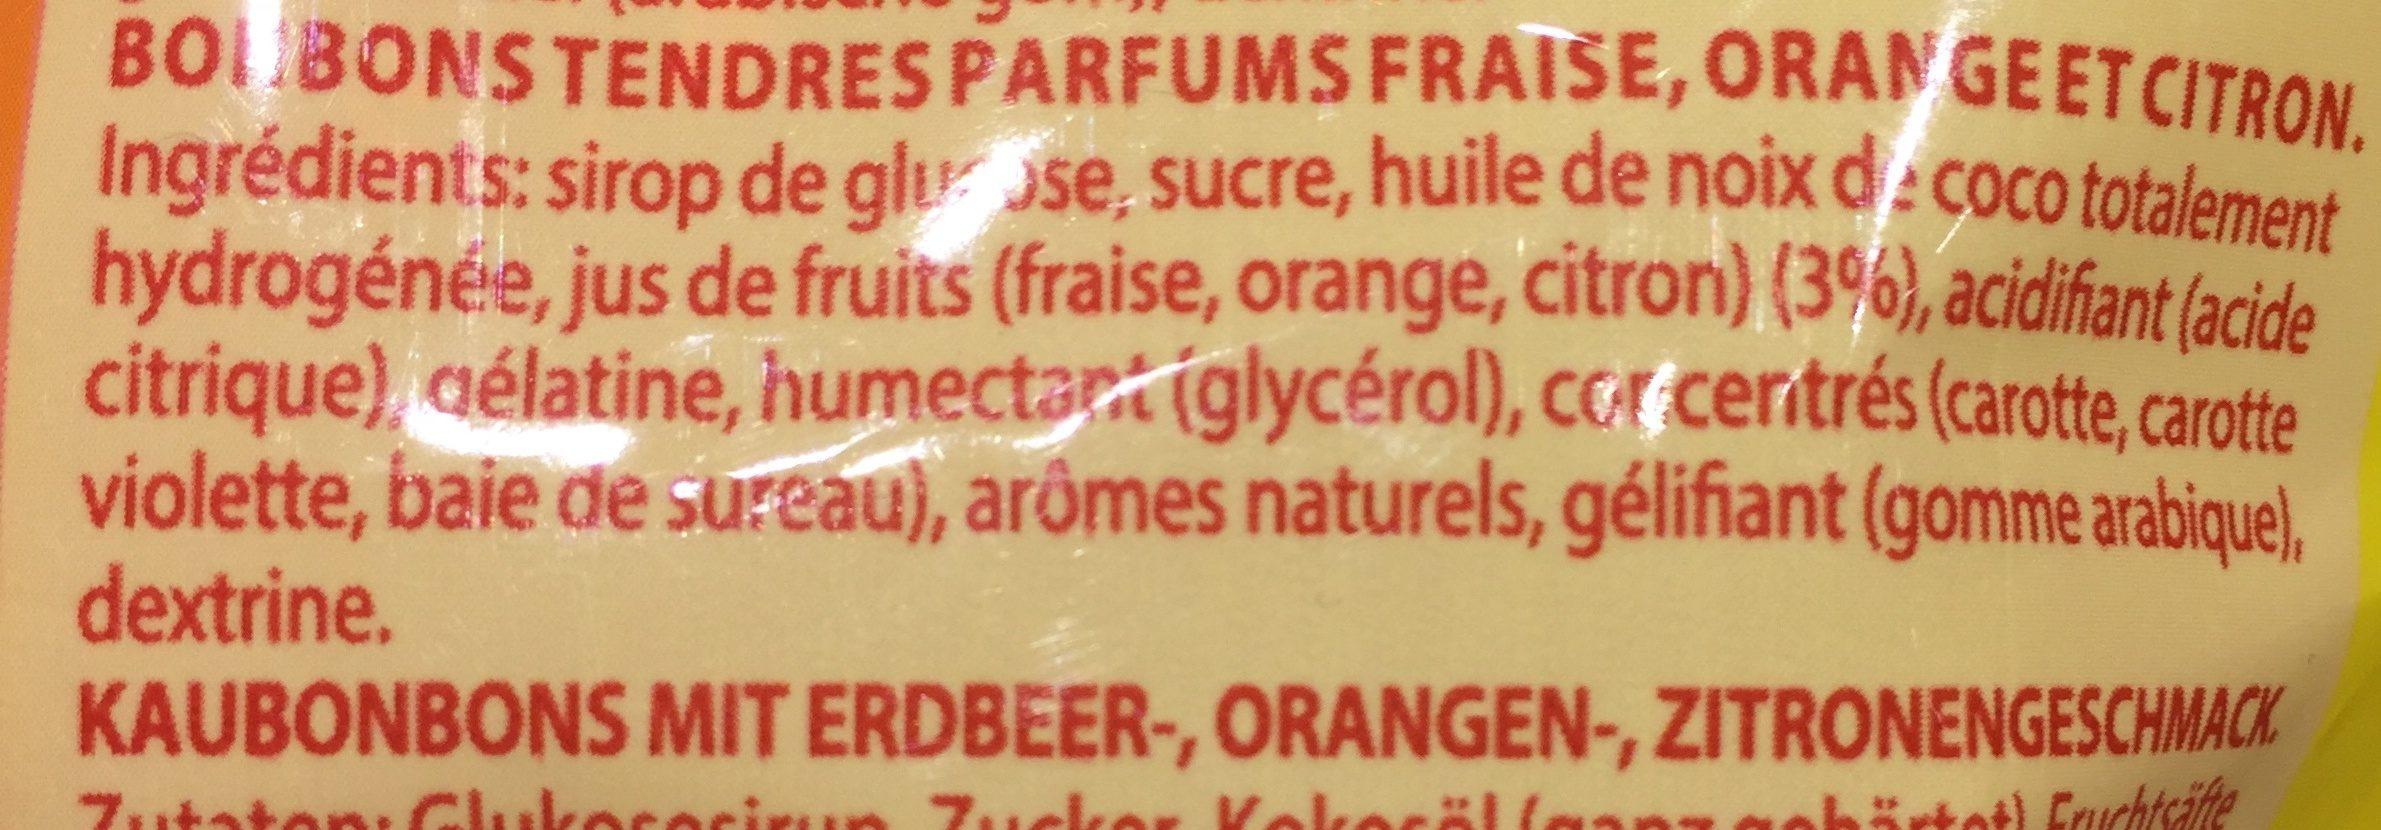 Fruitella - Ingrédients - fr